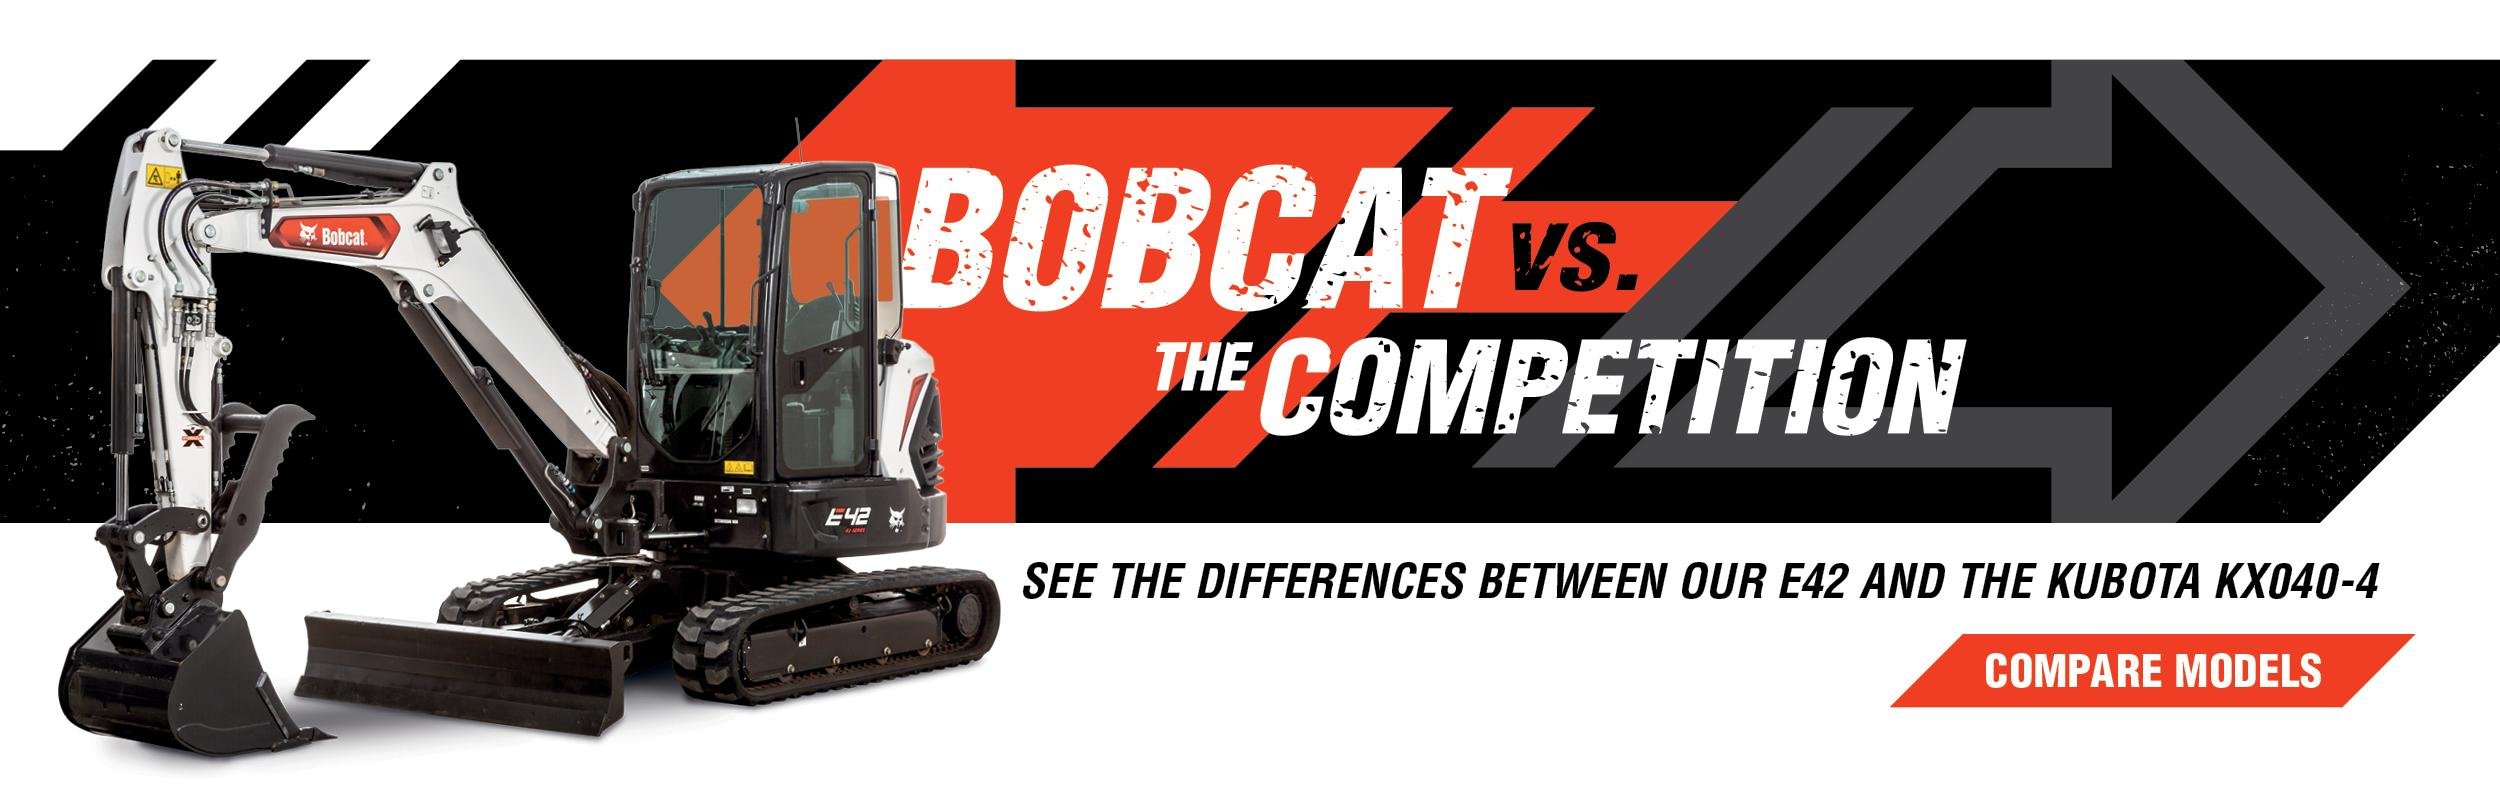 Bobcat E42 Mini Excavator Vs. Kubota KX040-4 Compare Models Banner